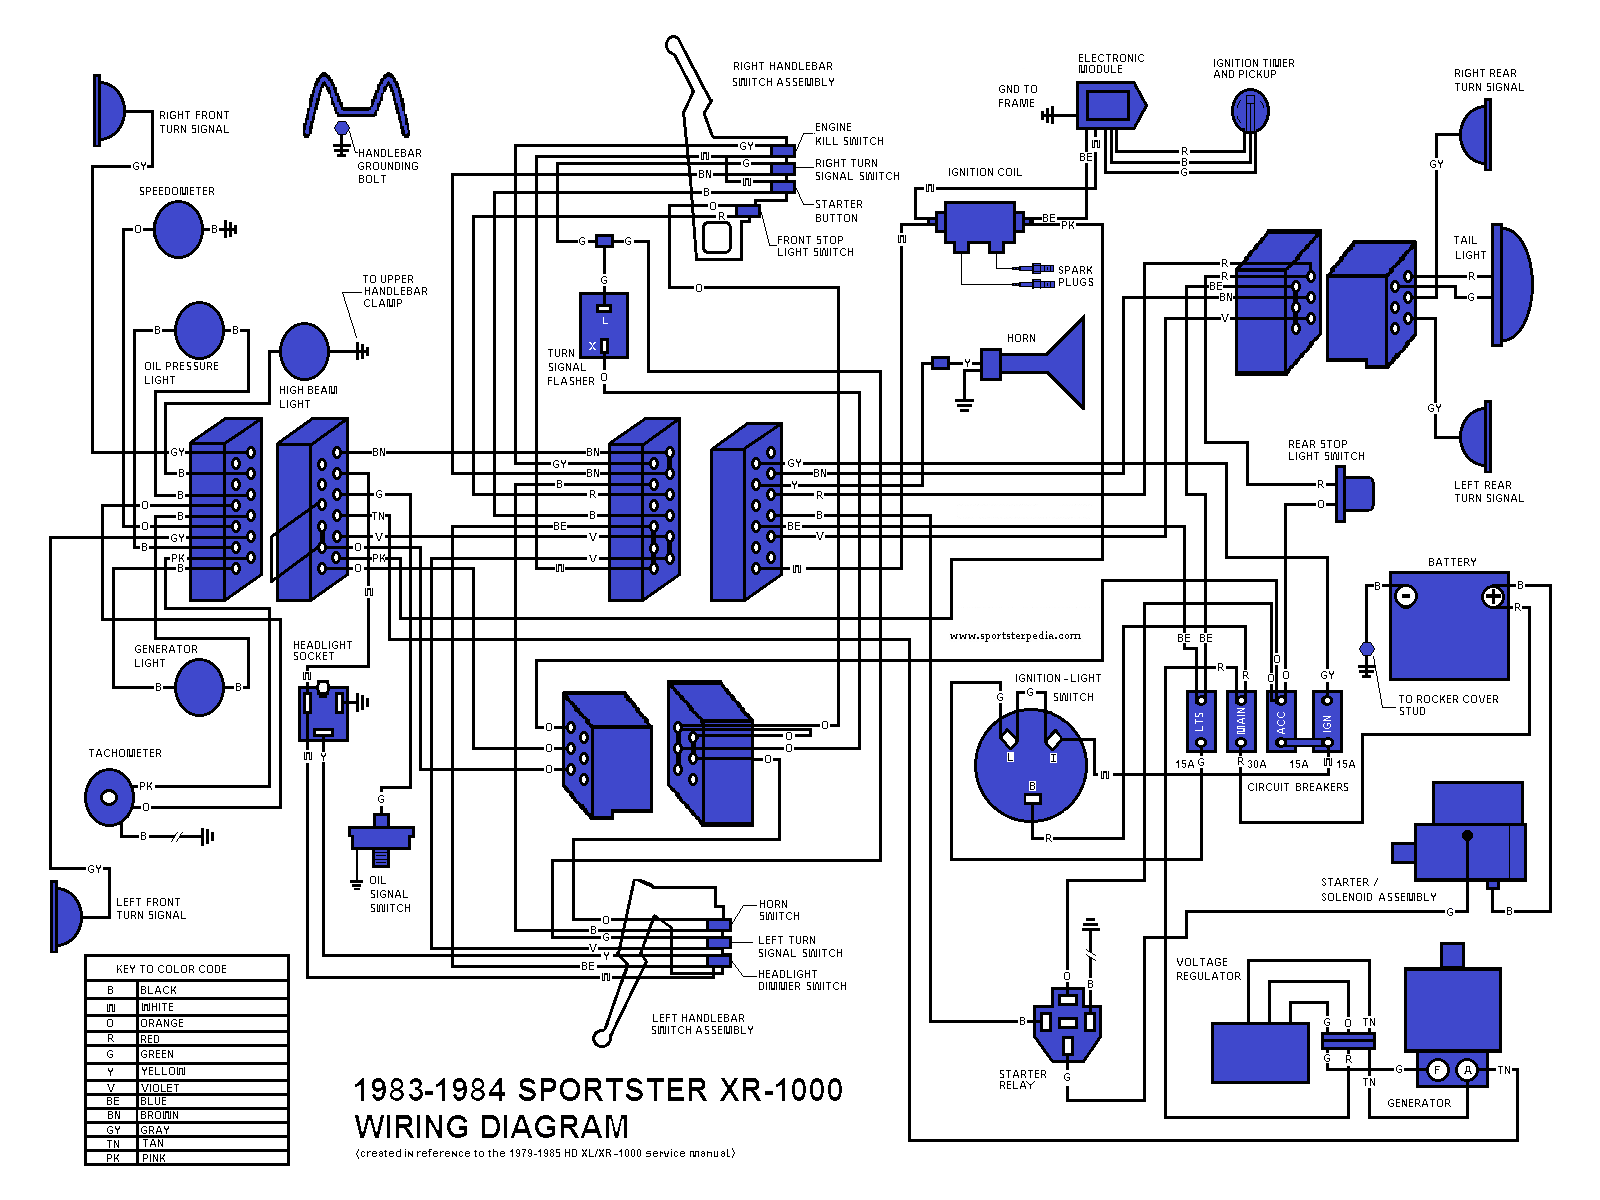 1984 Sportster Wiring Diagram